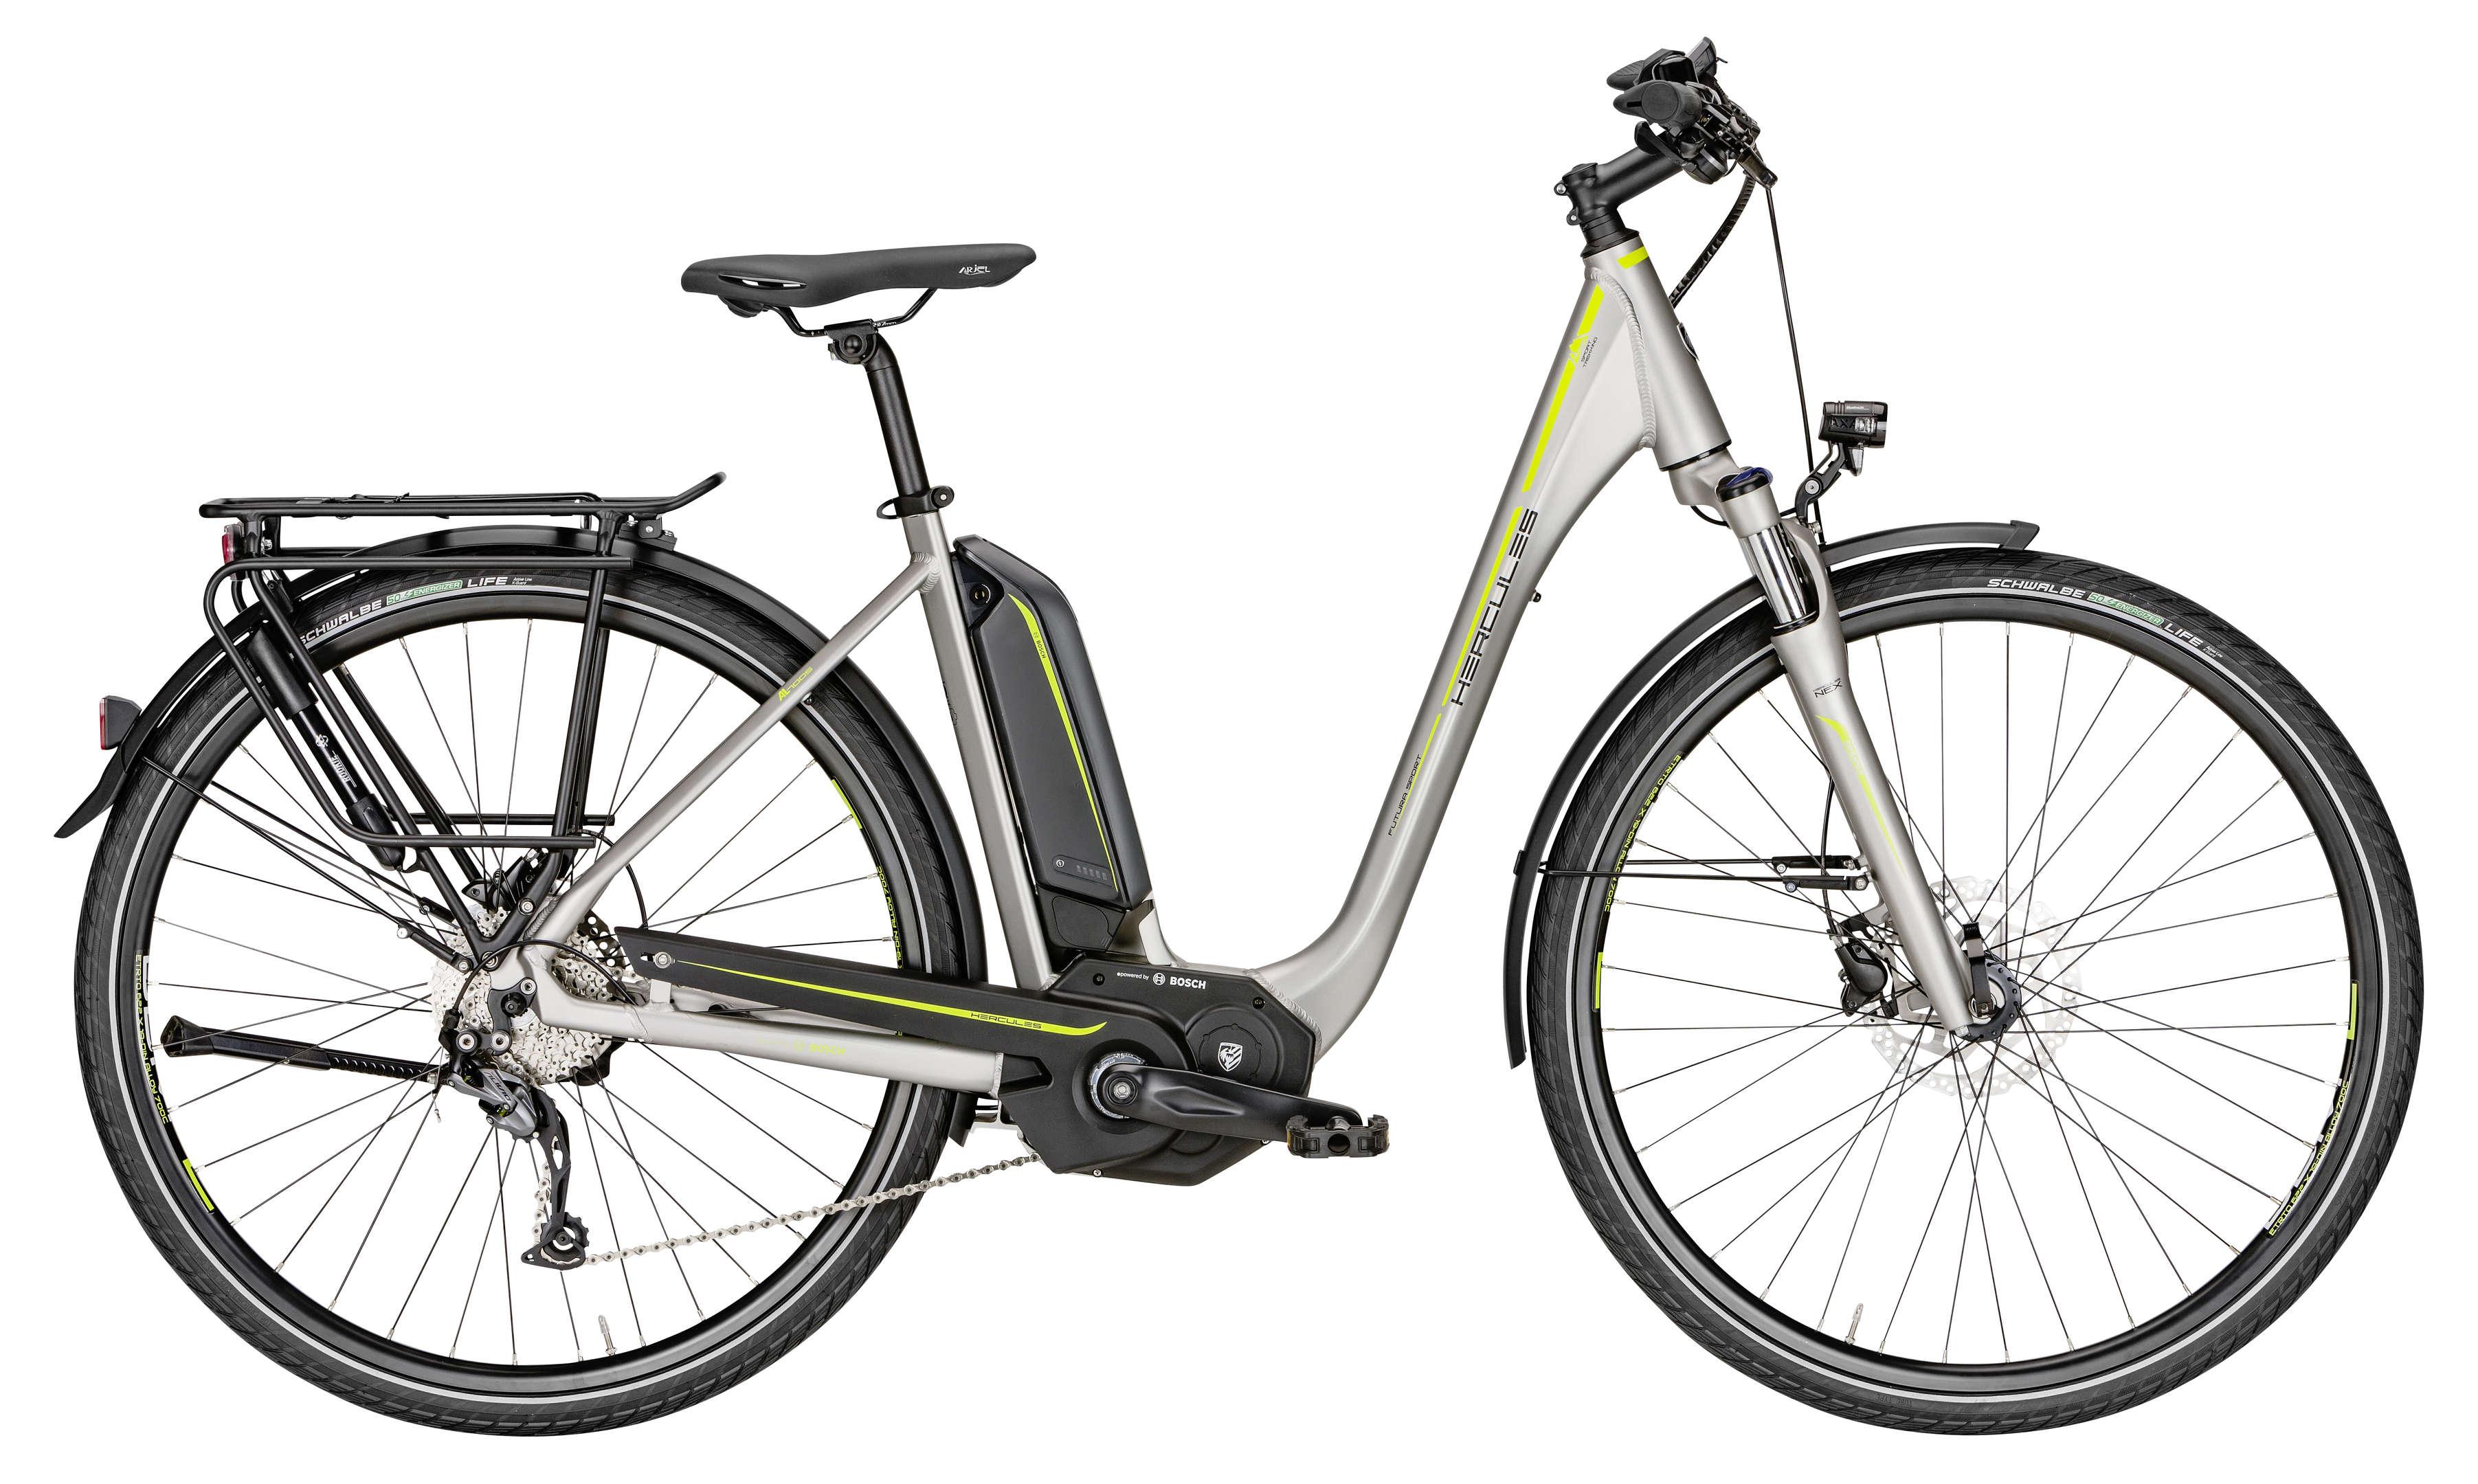 hercules e bike futura sport eurorad bikeleasingeurorad. Black Bedroom Furniture Sets. Home Design Ideas